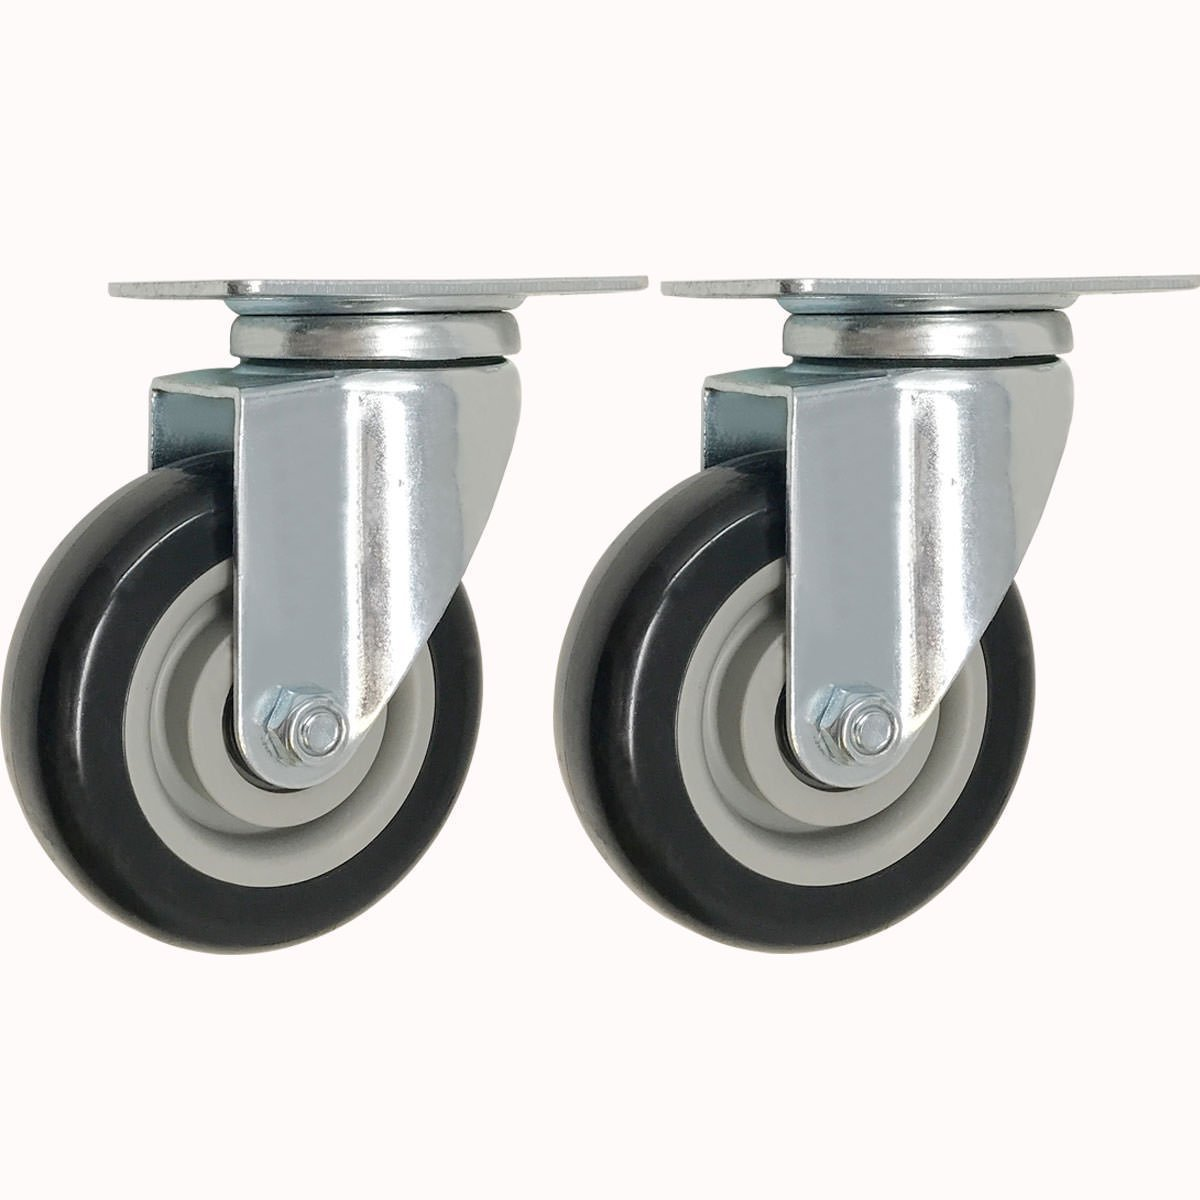 FactorDuty 2 Pack Caster Wheels Swivel Plate On Black Polyurethane Wheels (4 inch Plate)